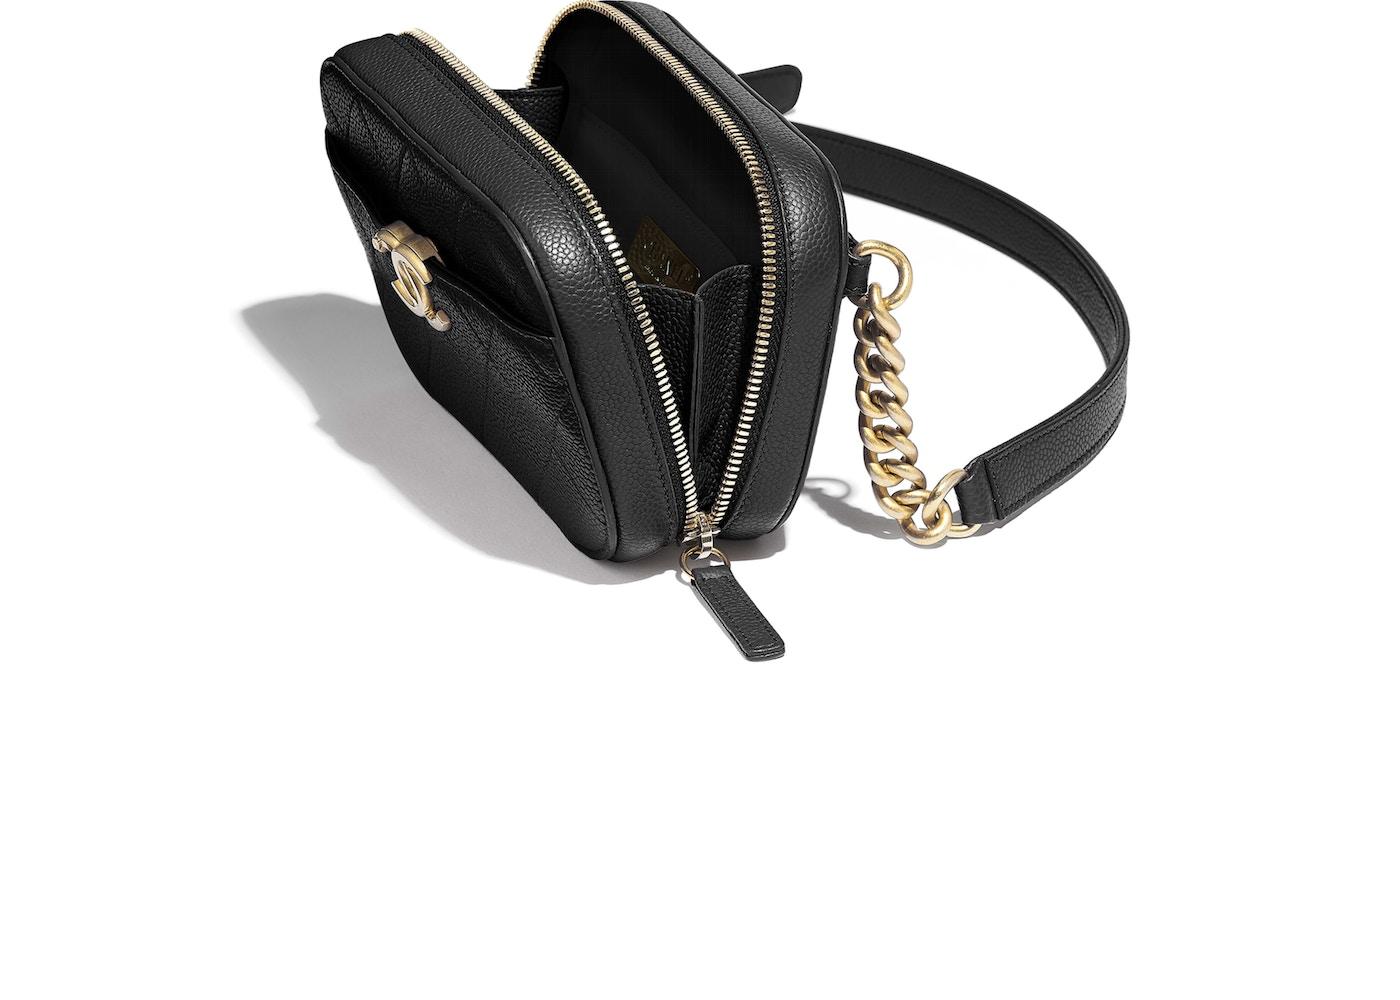 50c856c0cbc7 Chanel Waist Bag Stitched Grained Calfskin Gold-tone Black